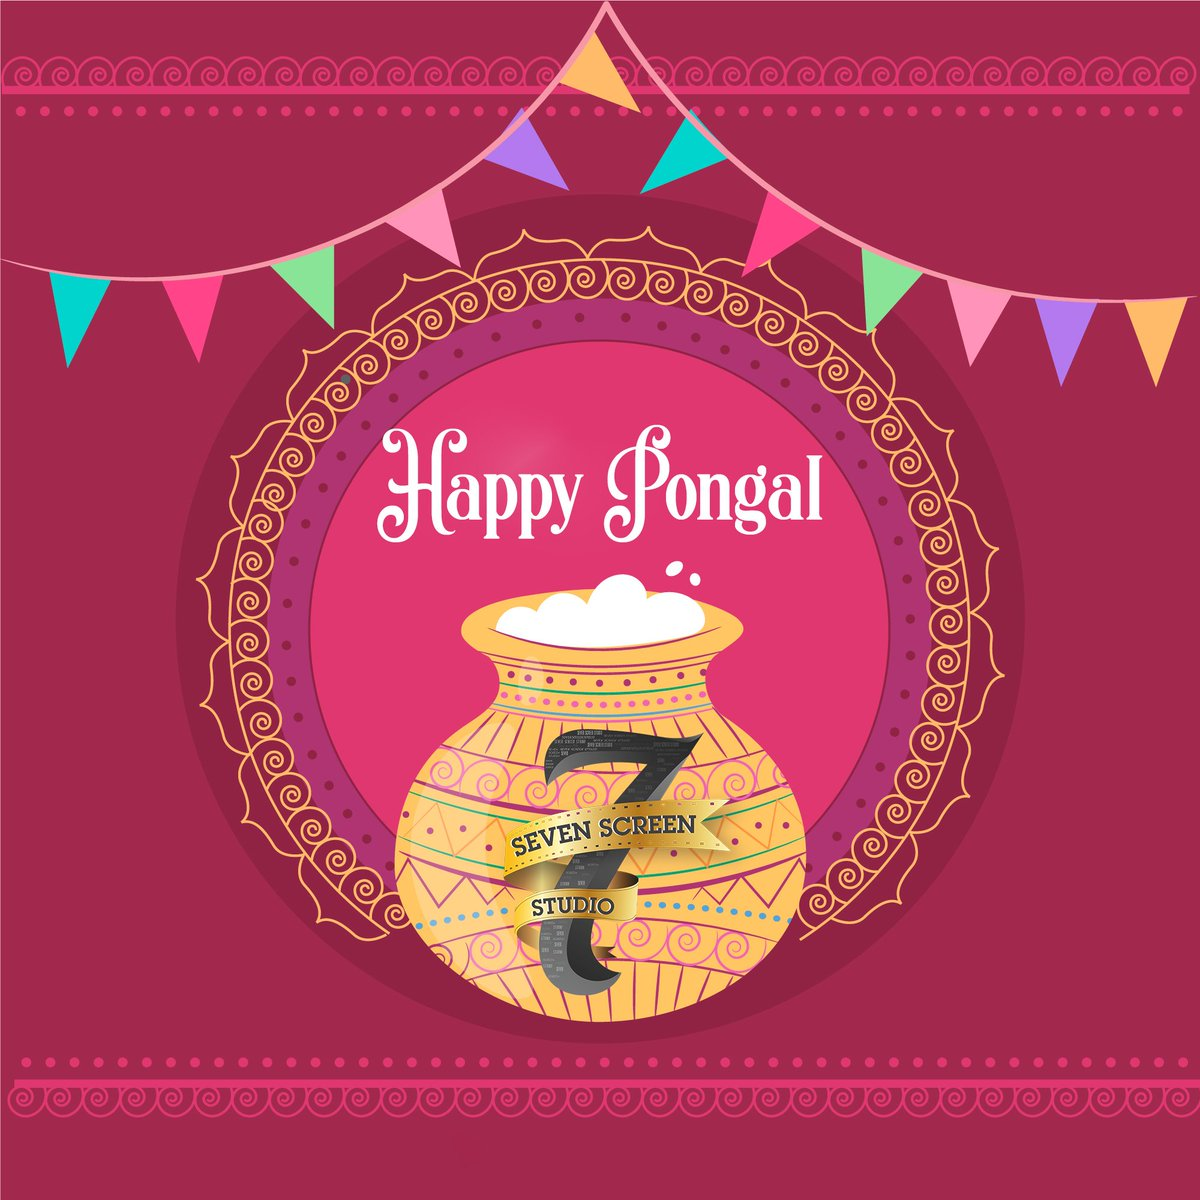 Team @7screenstudio wishing you all a very very #HappyPongal 💮💮  இனிய பொங்கல் வாழ்த்துக்கள் 🌾🌾  #MasterPongal